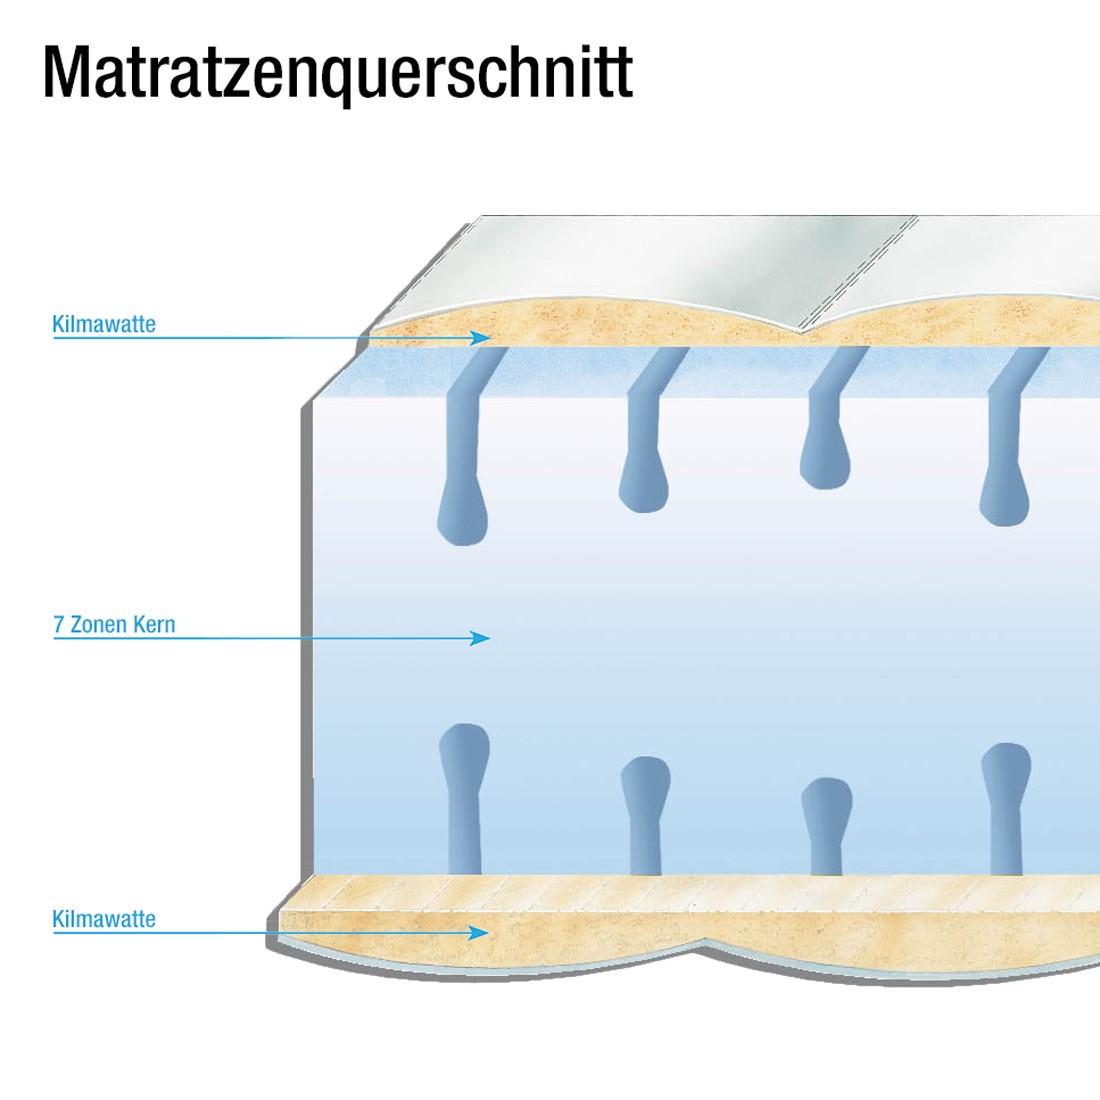 58 sparen 7 zonen waterlily kaltschaummatratze jubel ks ab 279 99 cherry m bel home24. Black Bedroom Furniture Sets. Home Design Ideas